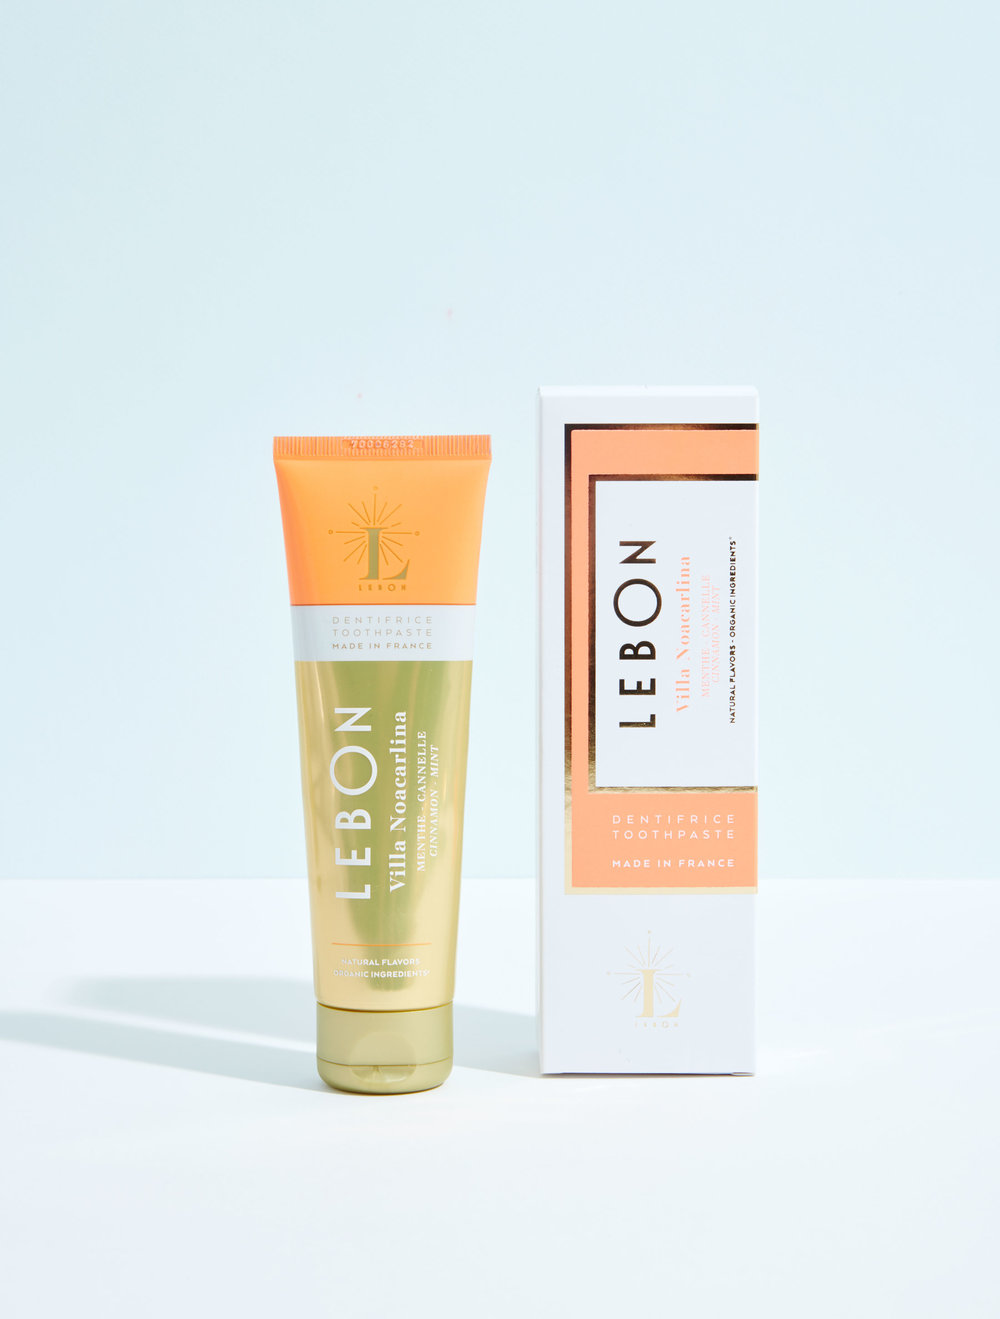 Lebon organic toothpaste - Villa Noacarlina